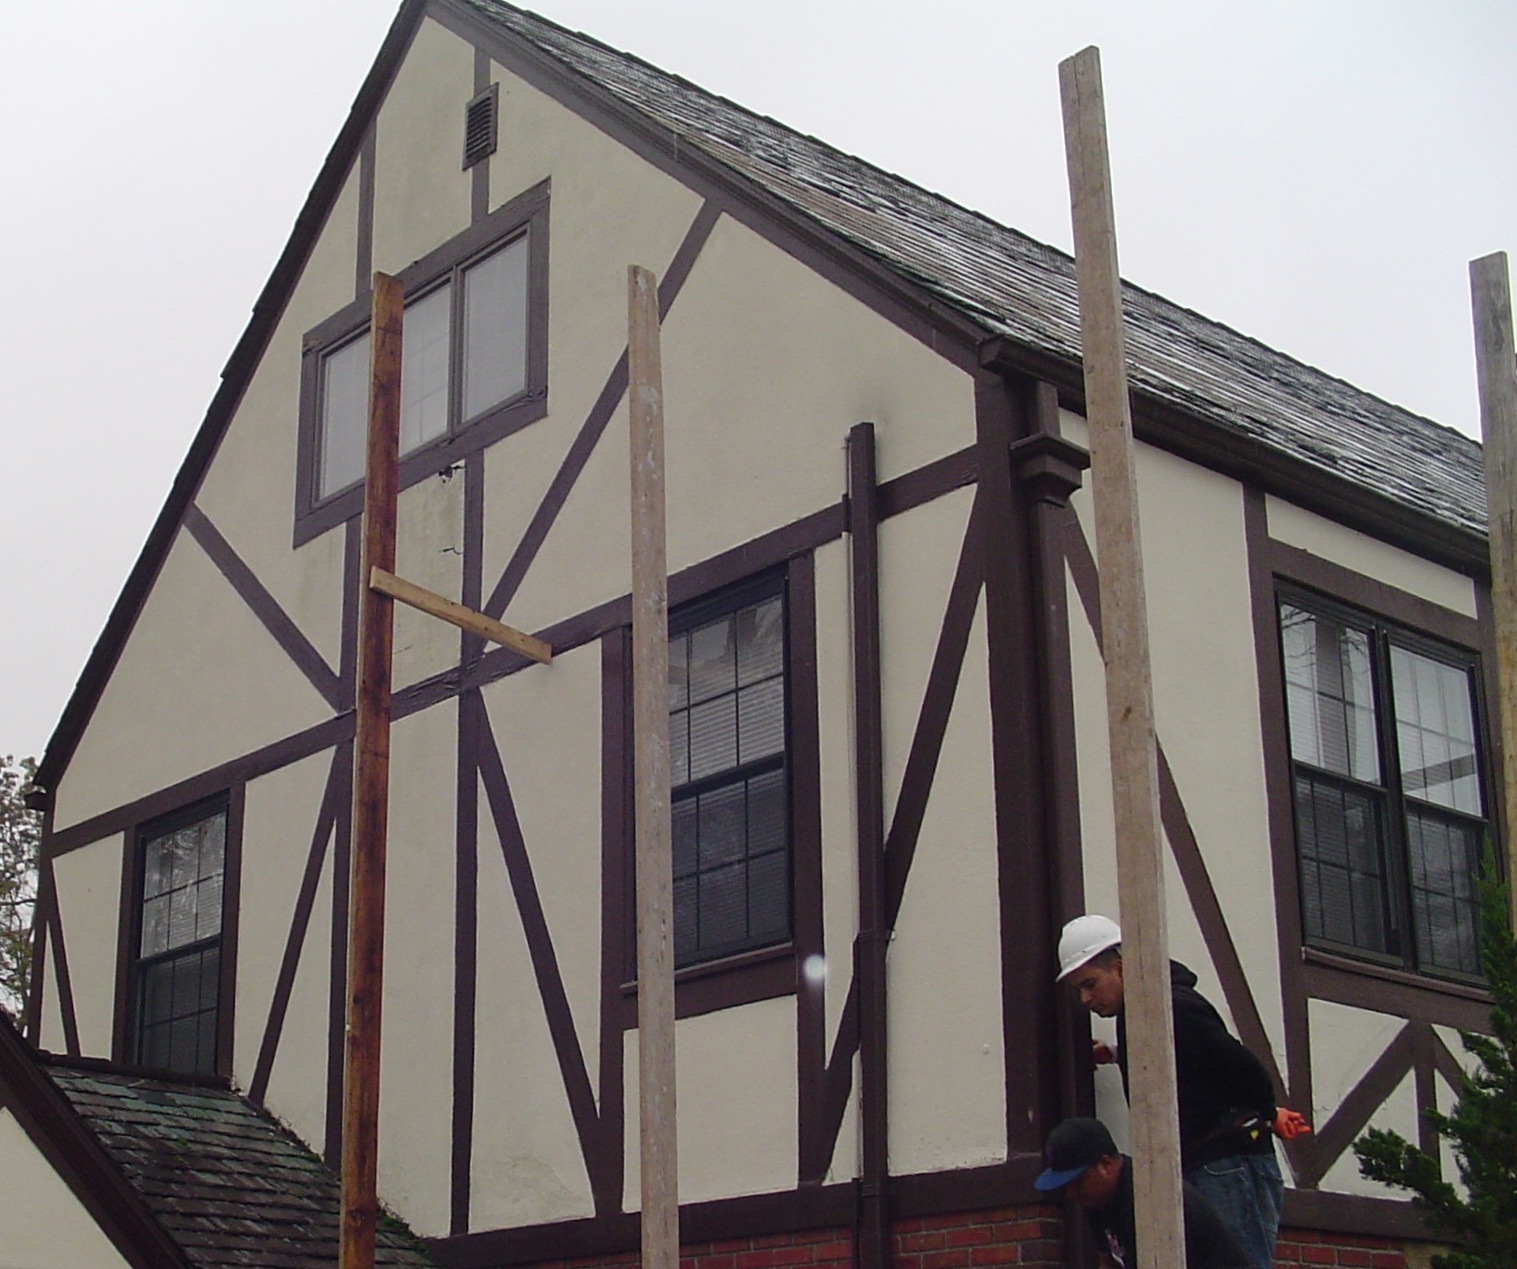 Rotted wood tudor board facade